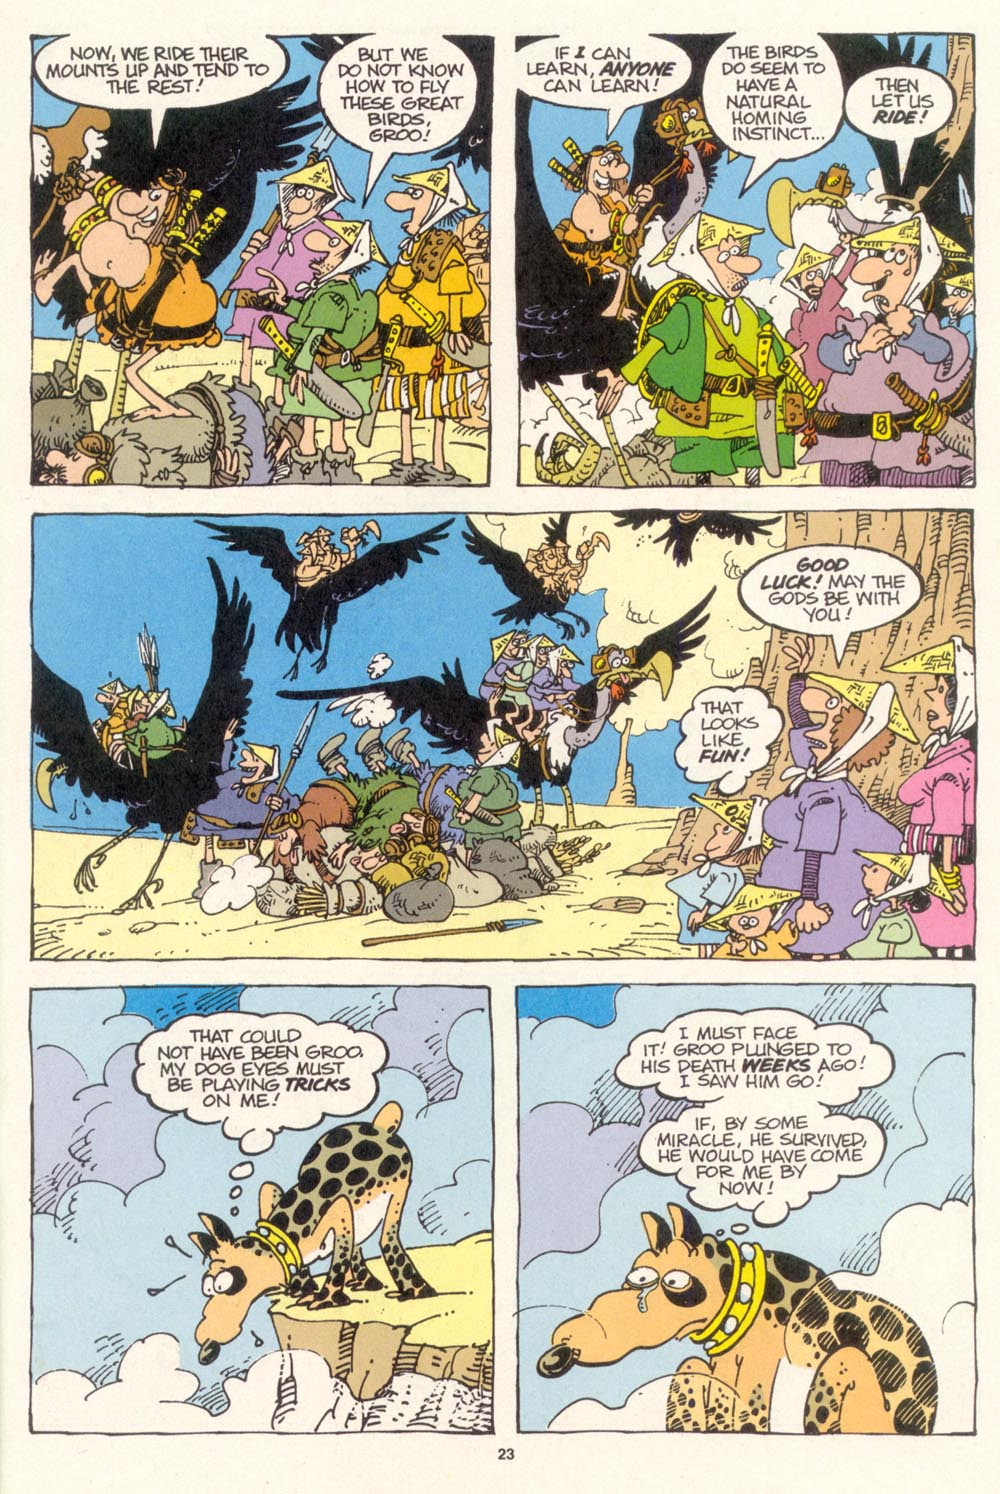 Read online Sergio Aragonés Groo the Wanderer comic -  Issue #115 - 25